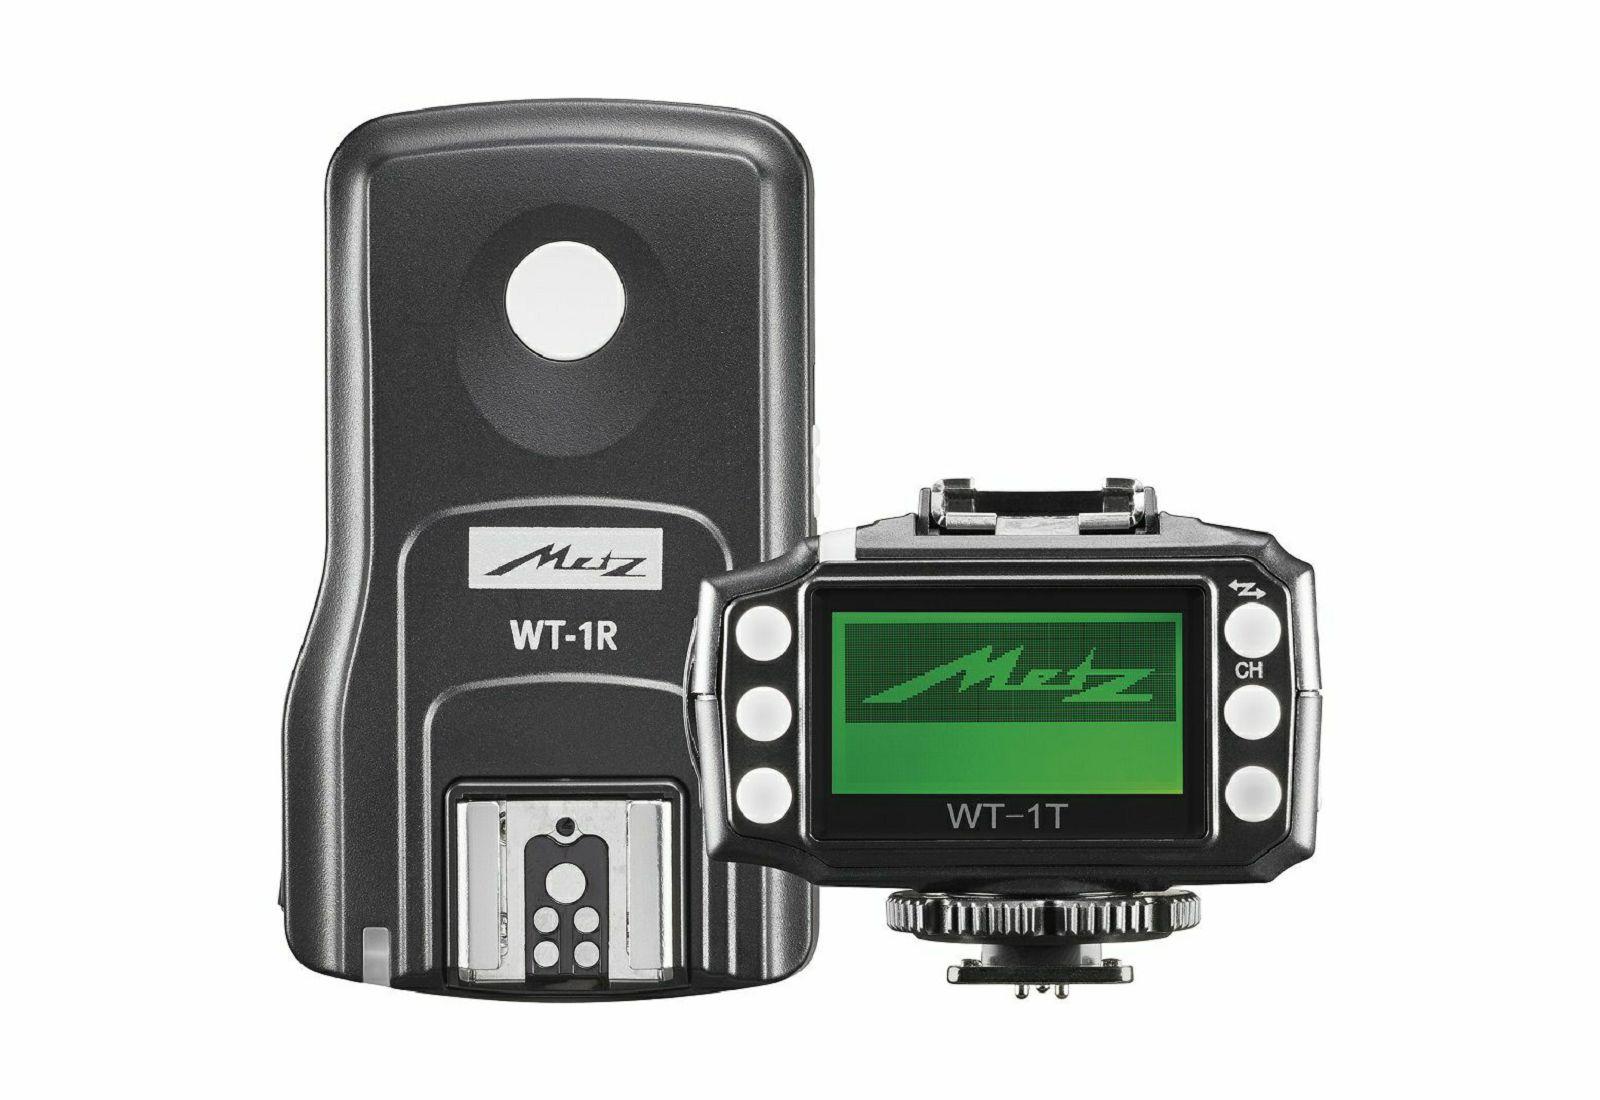 Metz WT-1 TTL HSS KIT komplet odašiljač + prijemnik za Canon Flash wireless Trigger set okidača za bljeskalicu